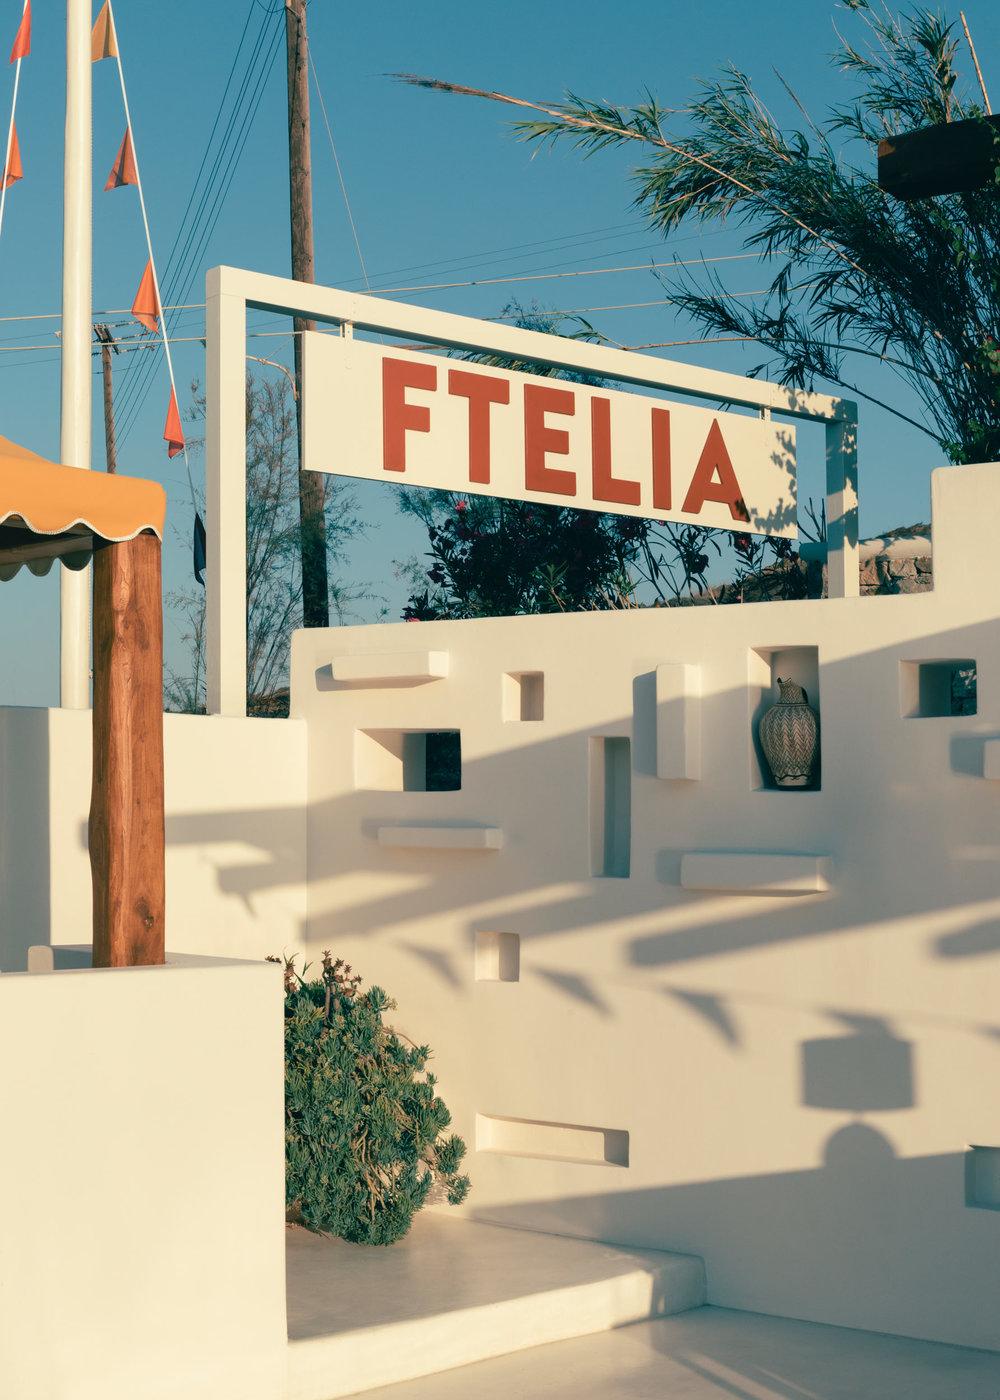 1Ftelia+Beach+Club+by+Fabrizio+Casiraghi+on+Anniversary+Magazine.jpg